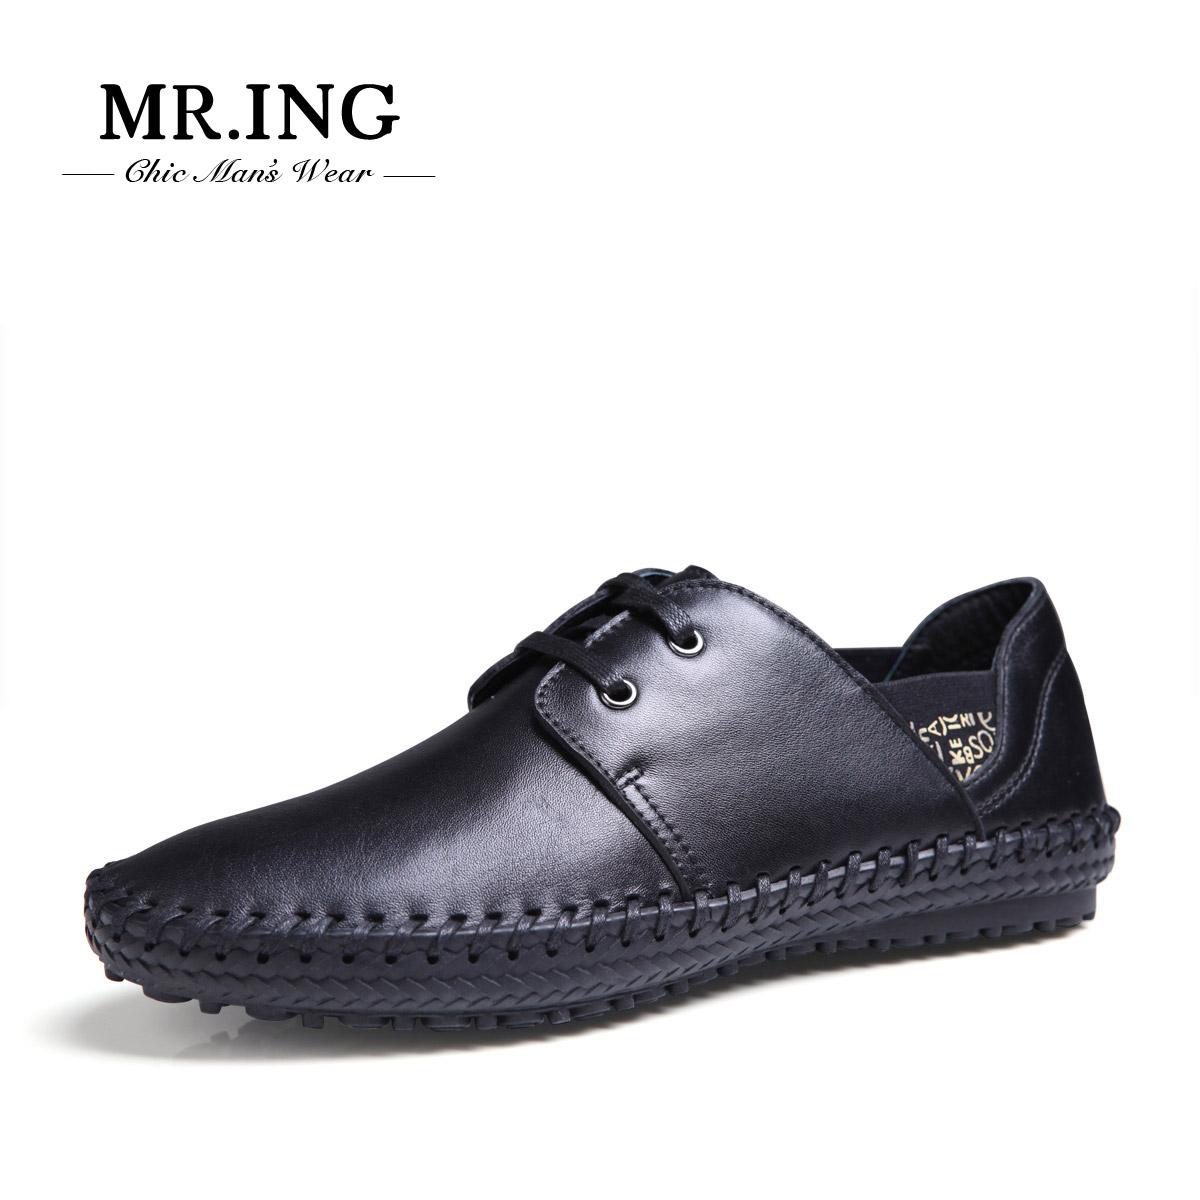 Демисезонные ботинки Mr. ing [F1327] Mr.ing F1370